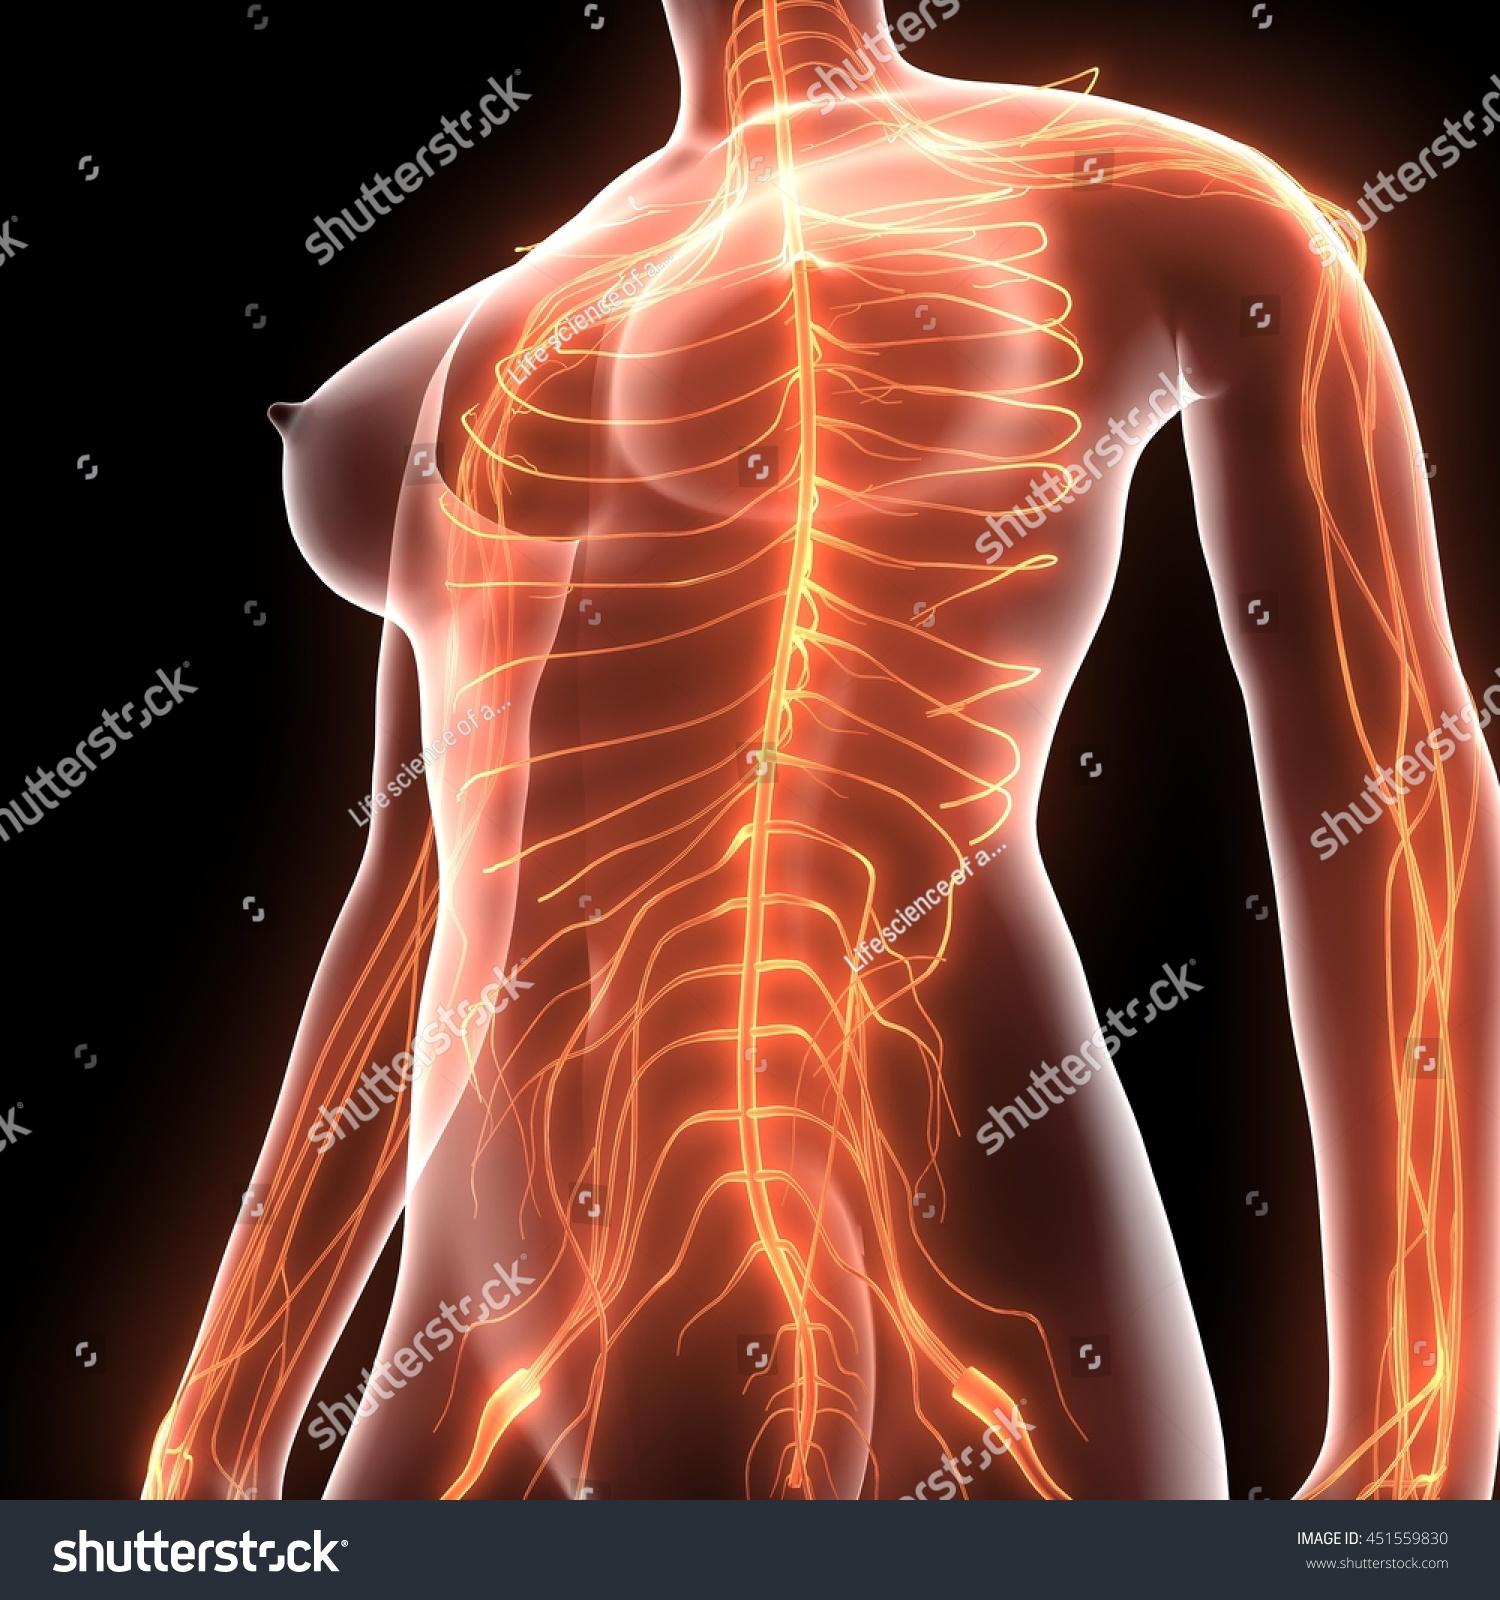 Human Body Nerves Veins Arteries Anatomy Stock Illustration ...